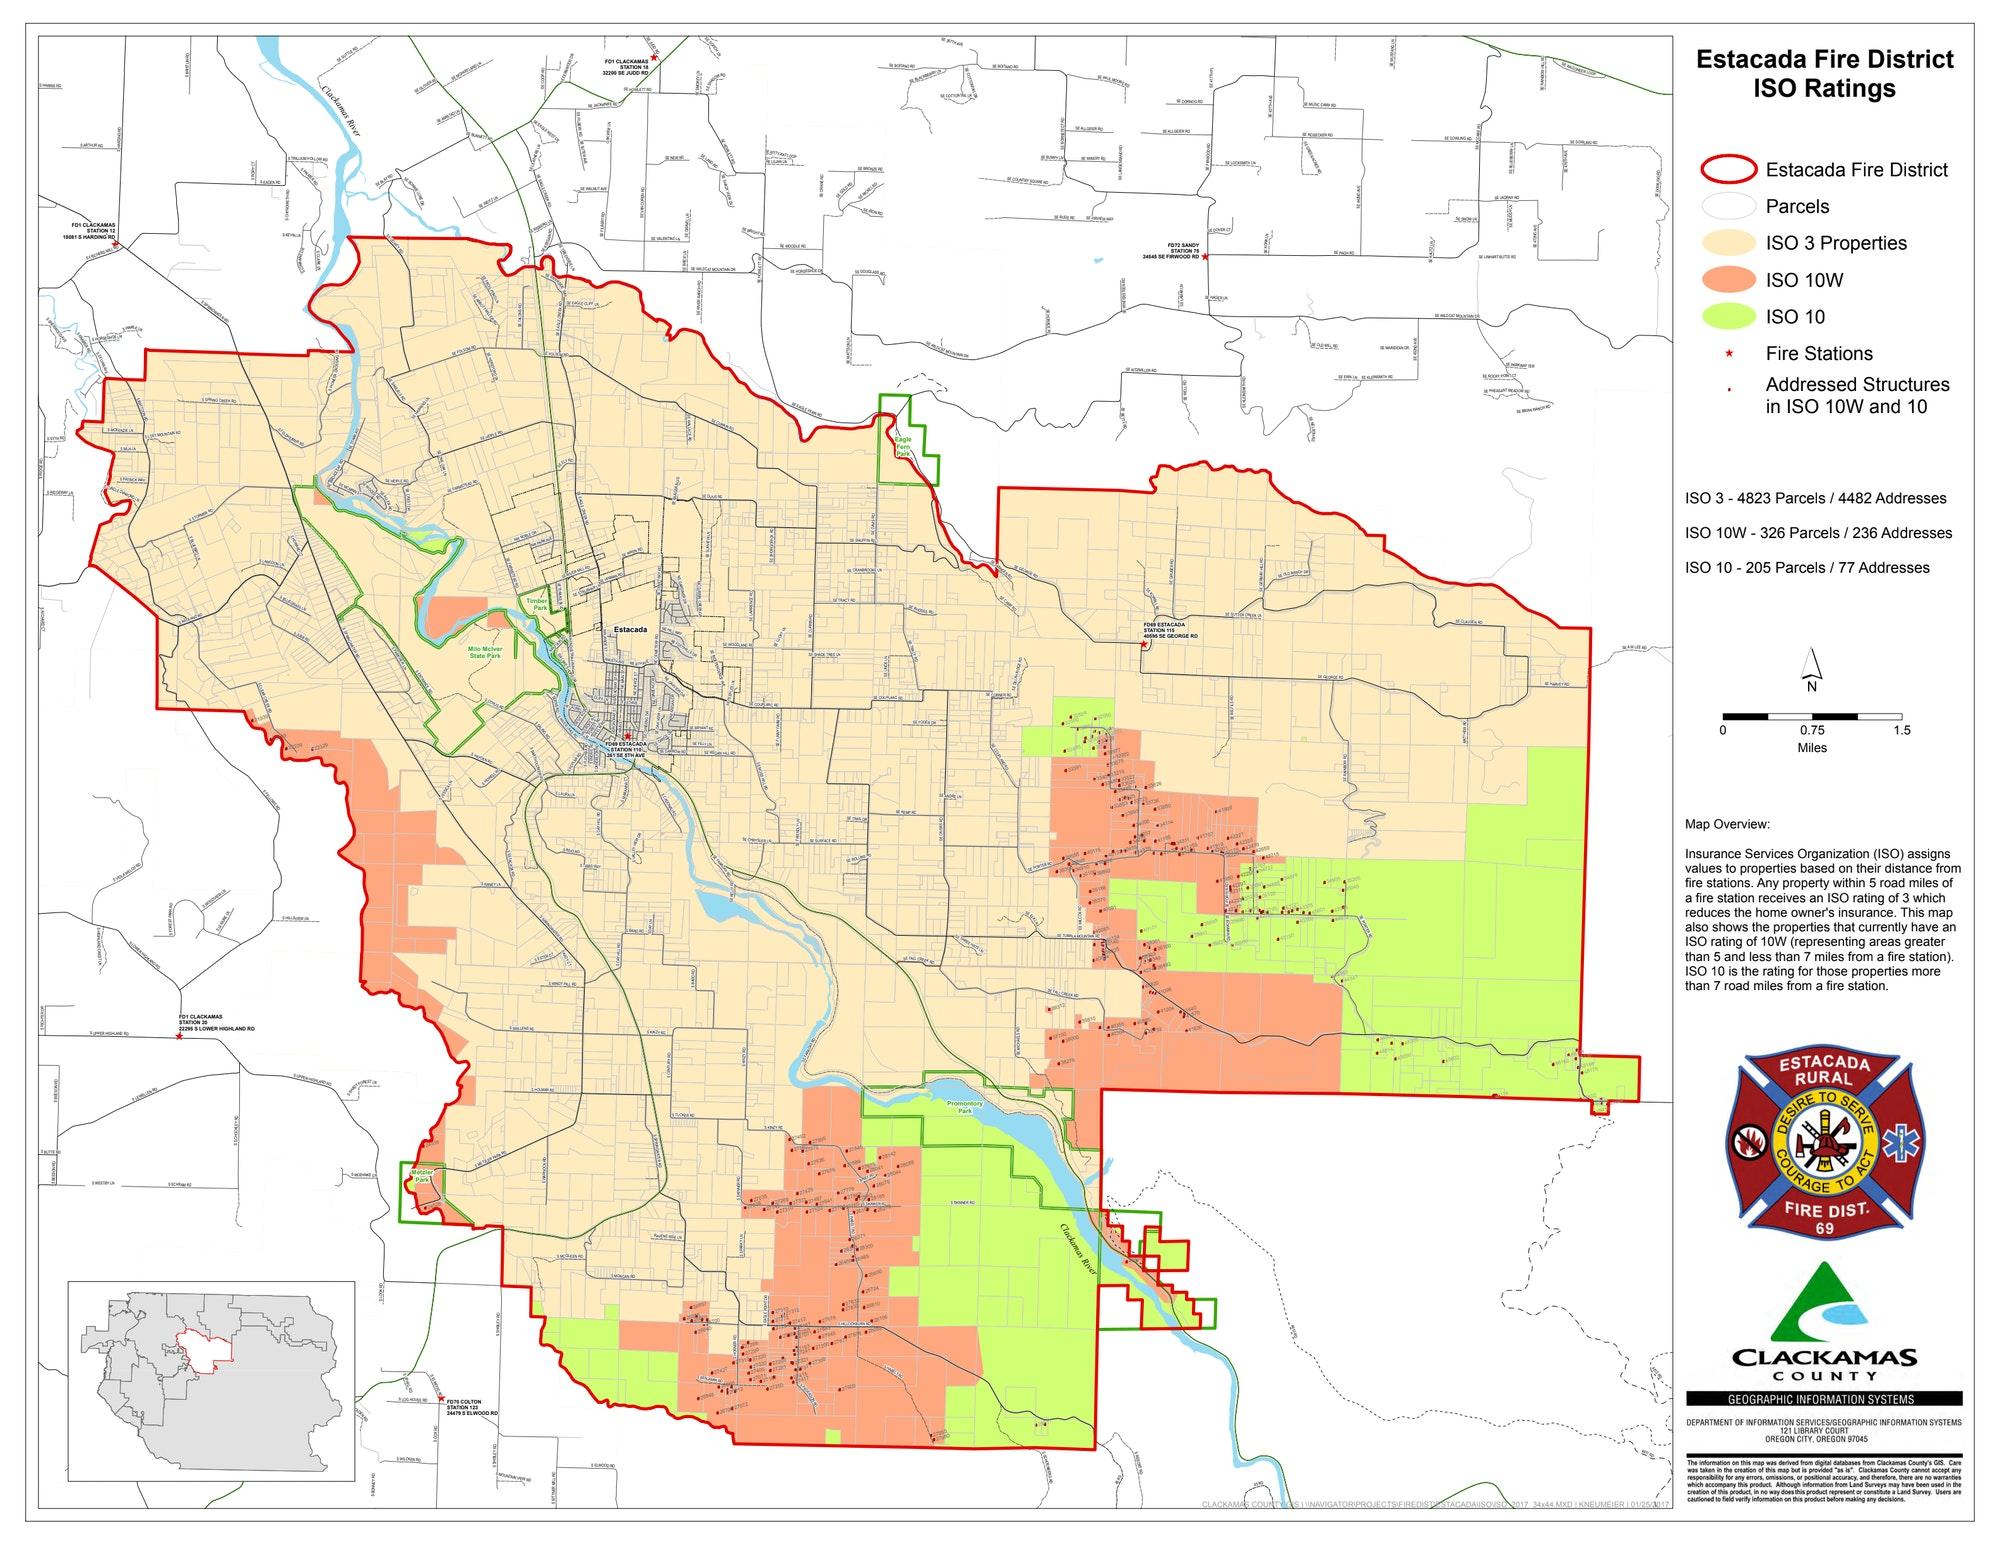 ISO Classification - Estacada Rural Fire District No. 69